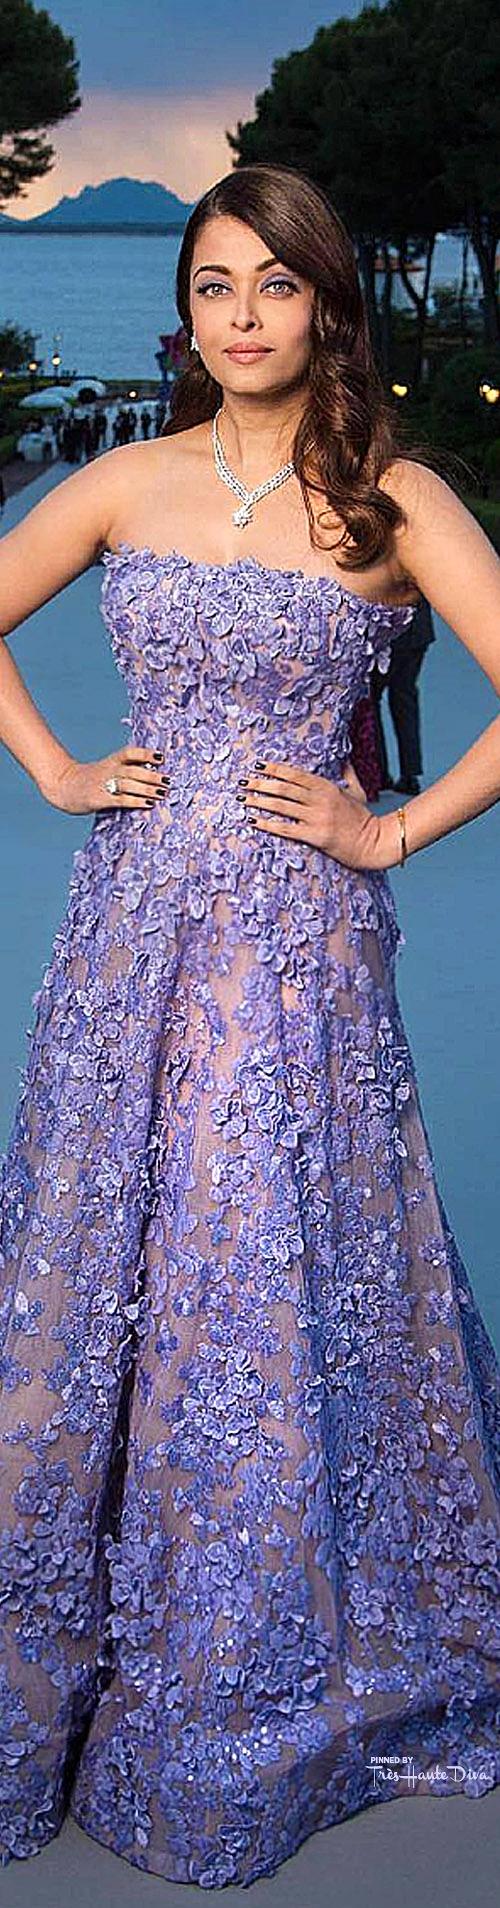 Aishwarya Rai Bachchan in Elie Saab Couture